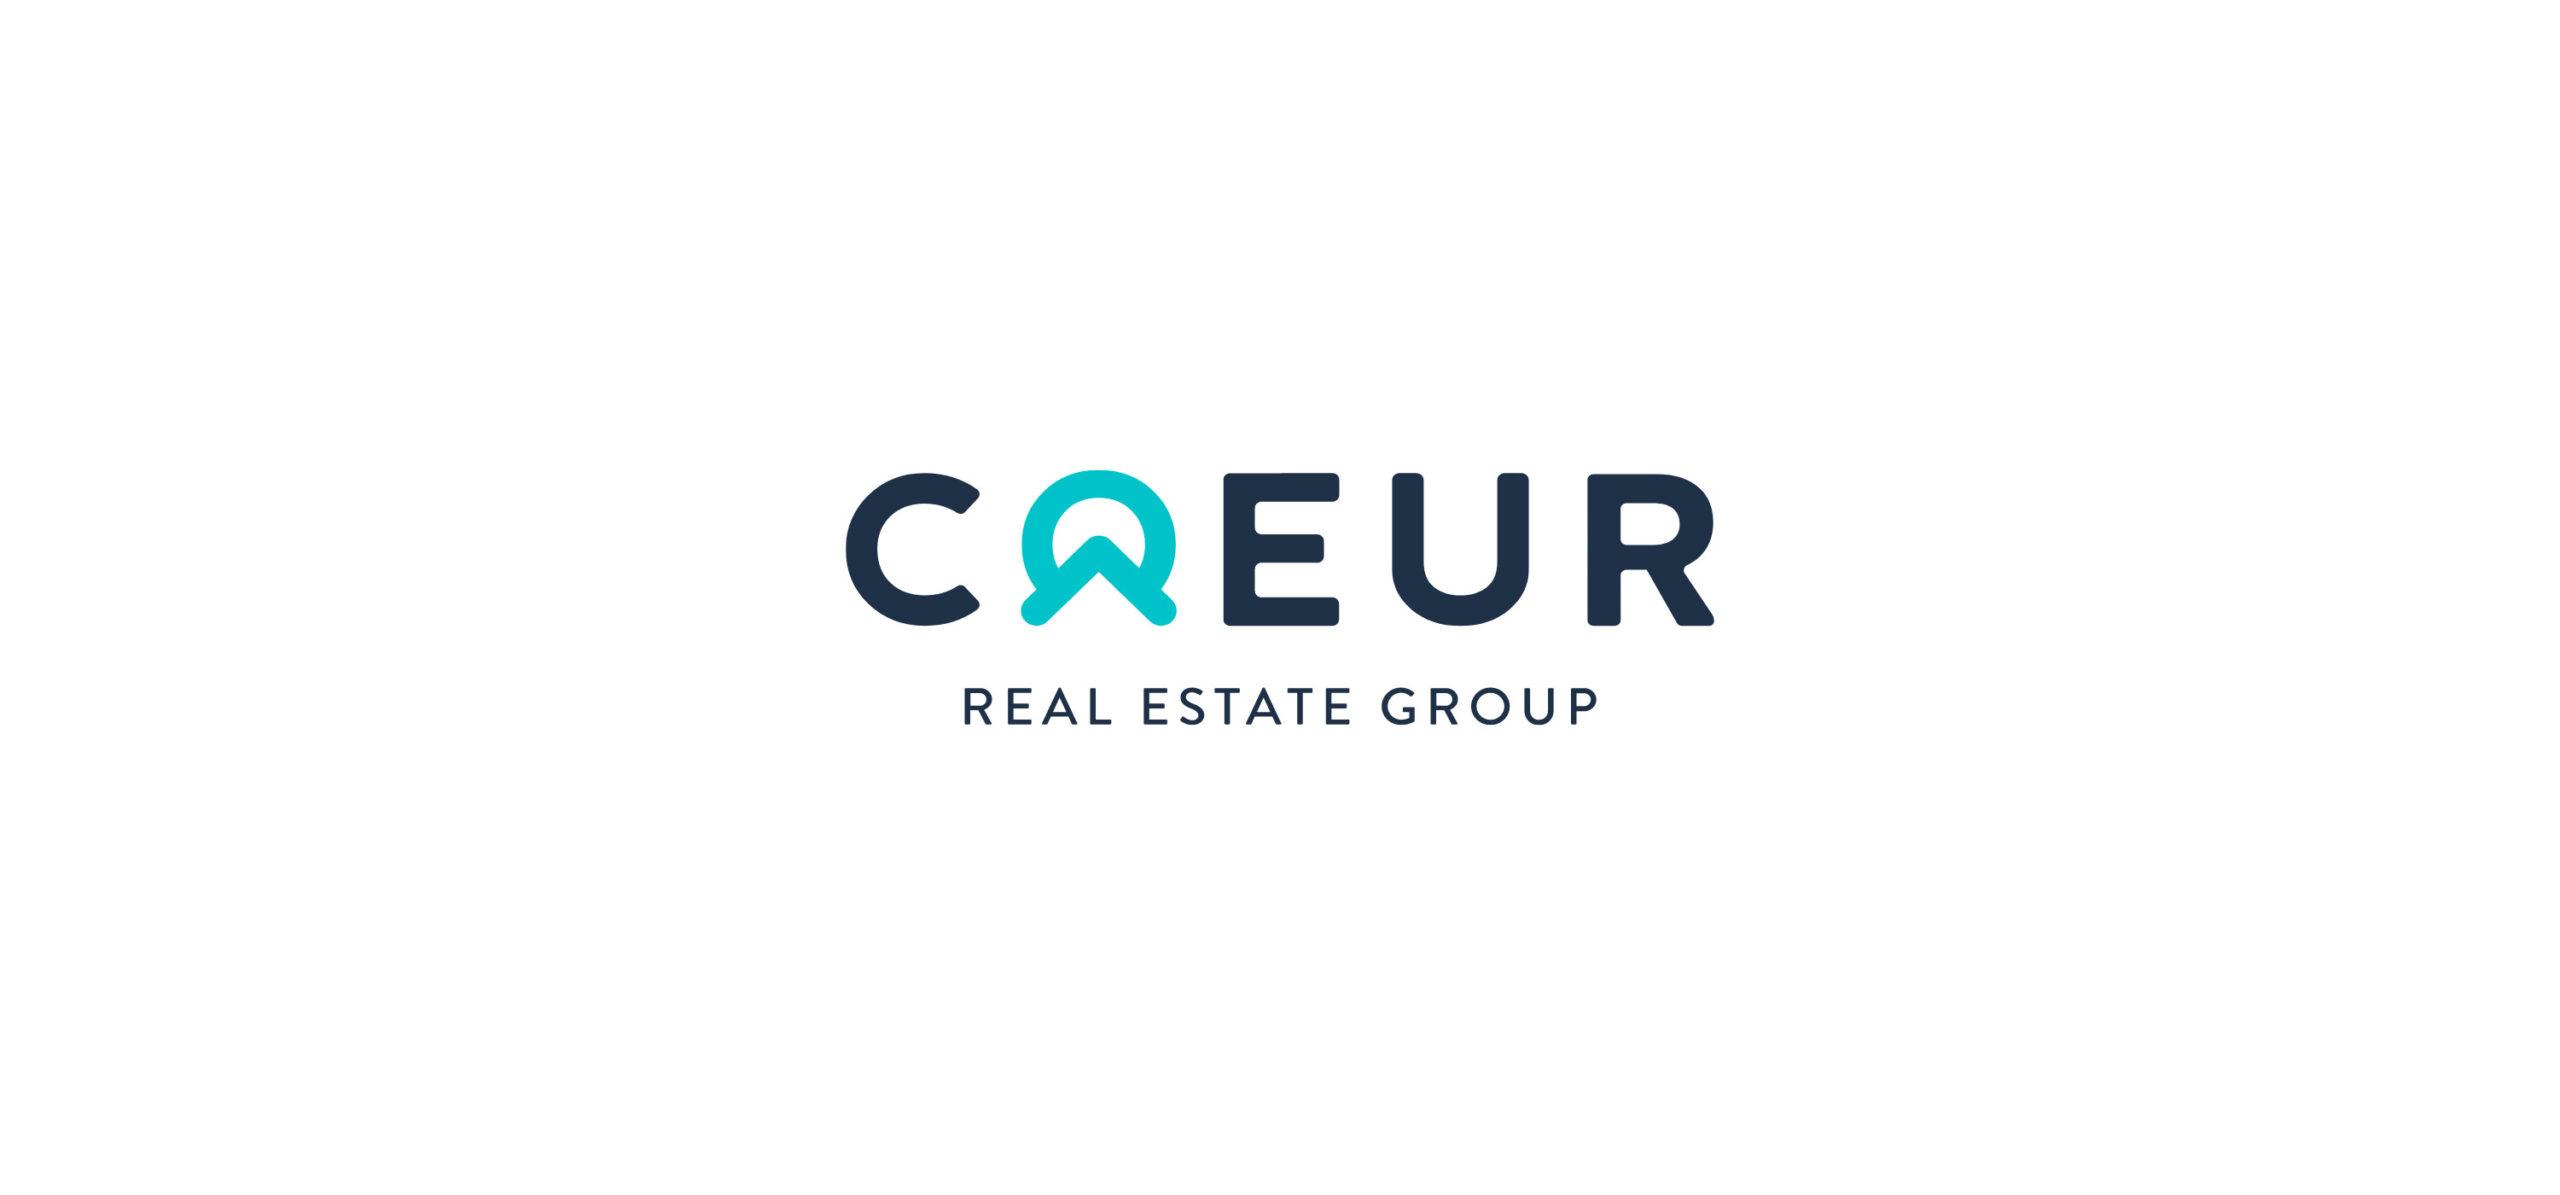 minneapolis-real-estate-logo-design-branding